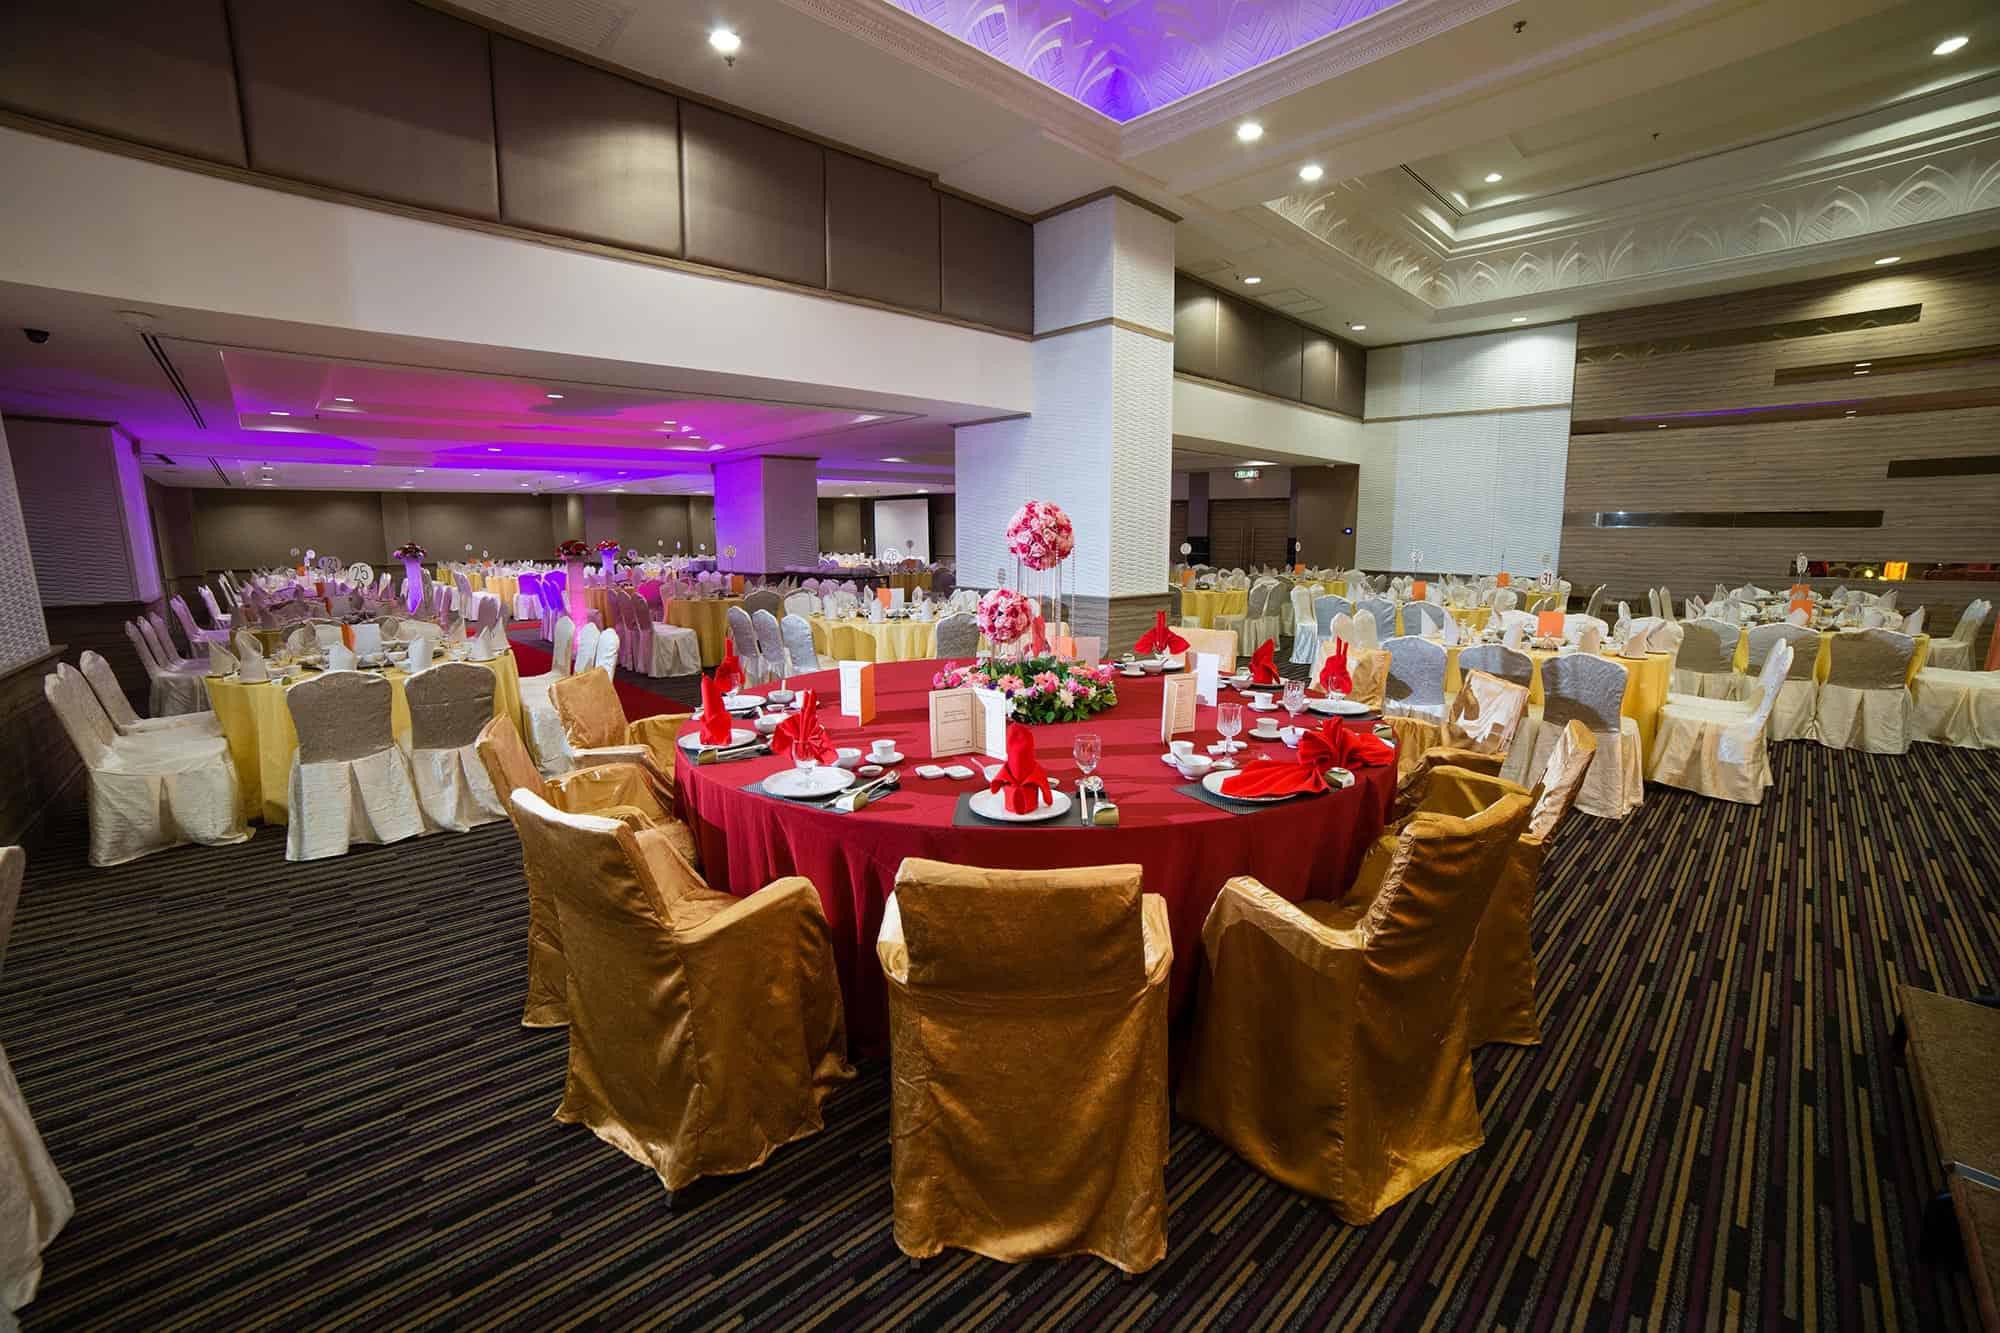 Sunway Hotel Seberang Jaya Photo 1